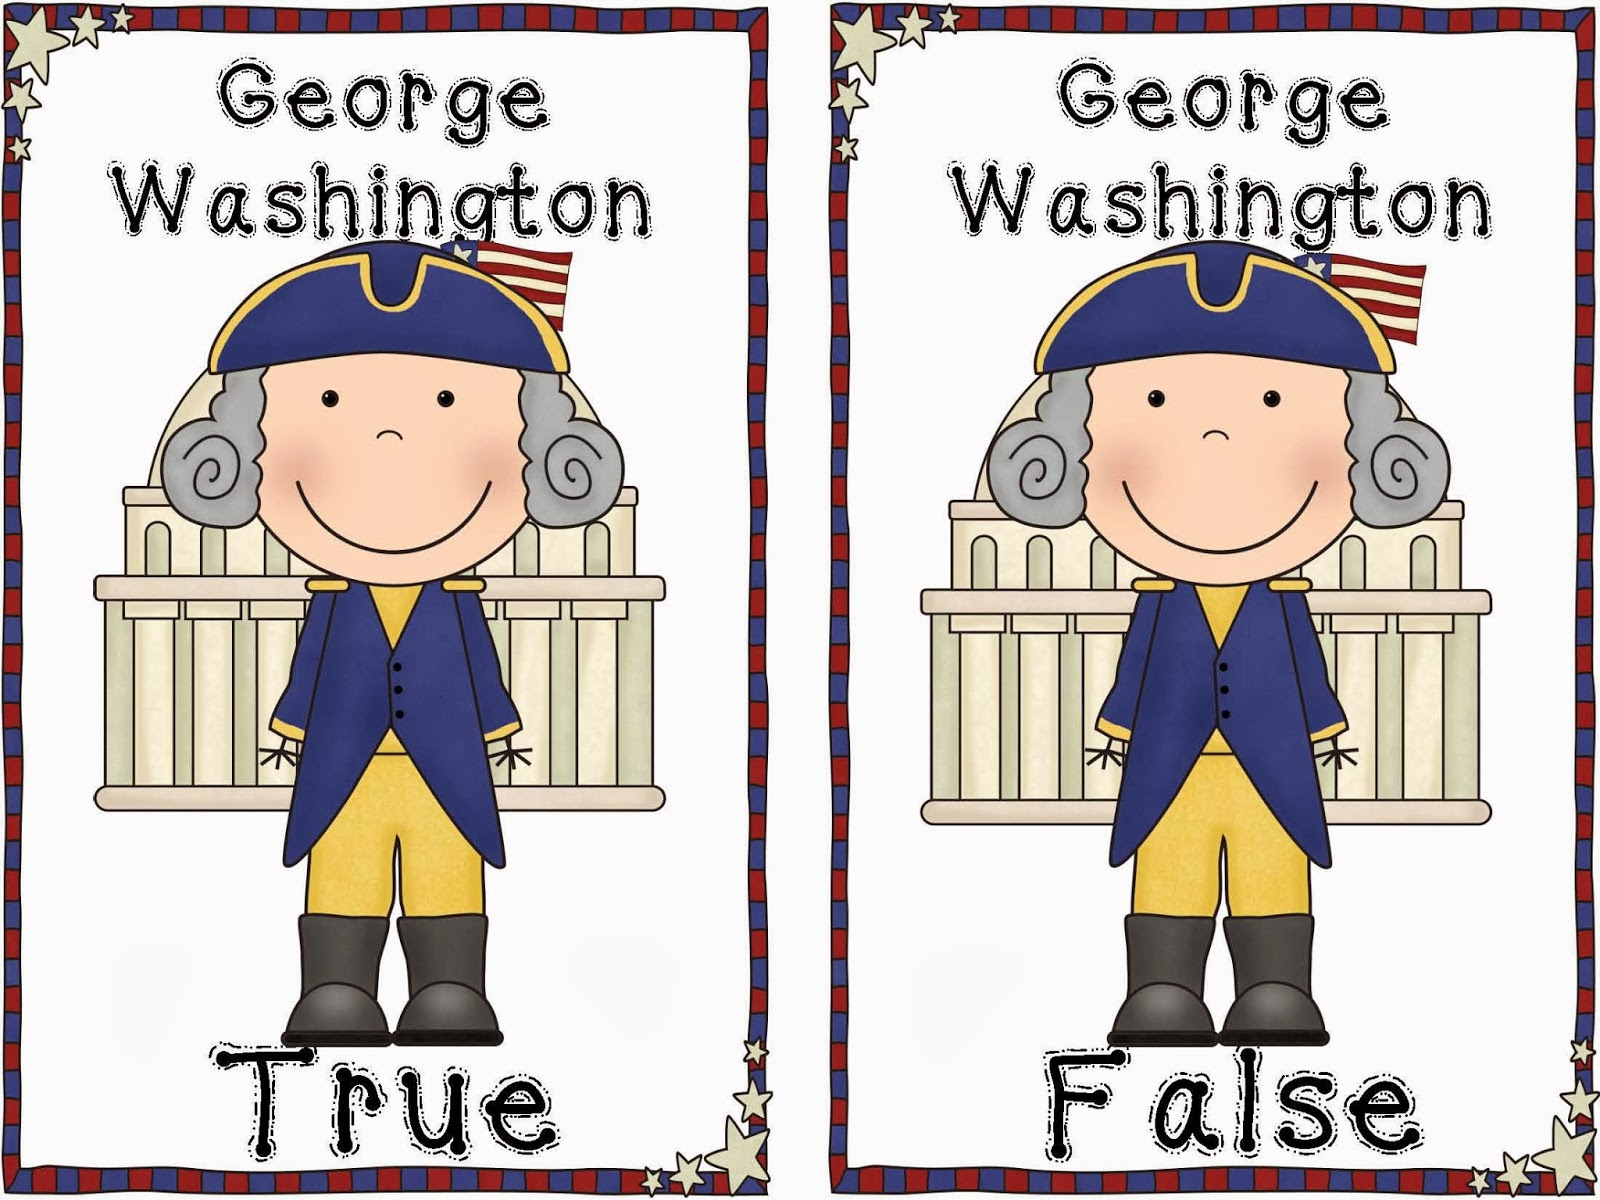 http://www.teacherspayteachers.com/Product/George-Washington-True-and-False-Pocket-Chart-Activity-1059355